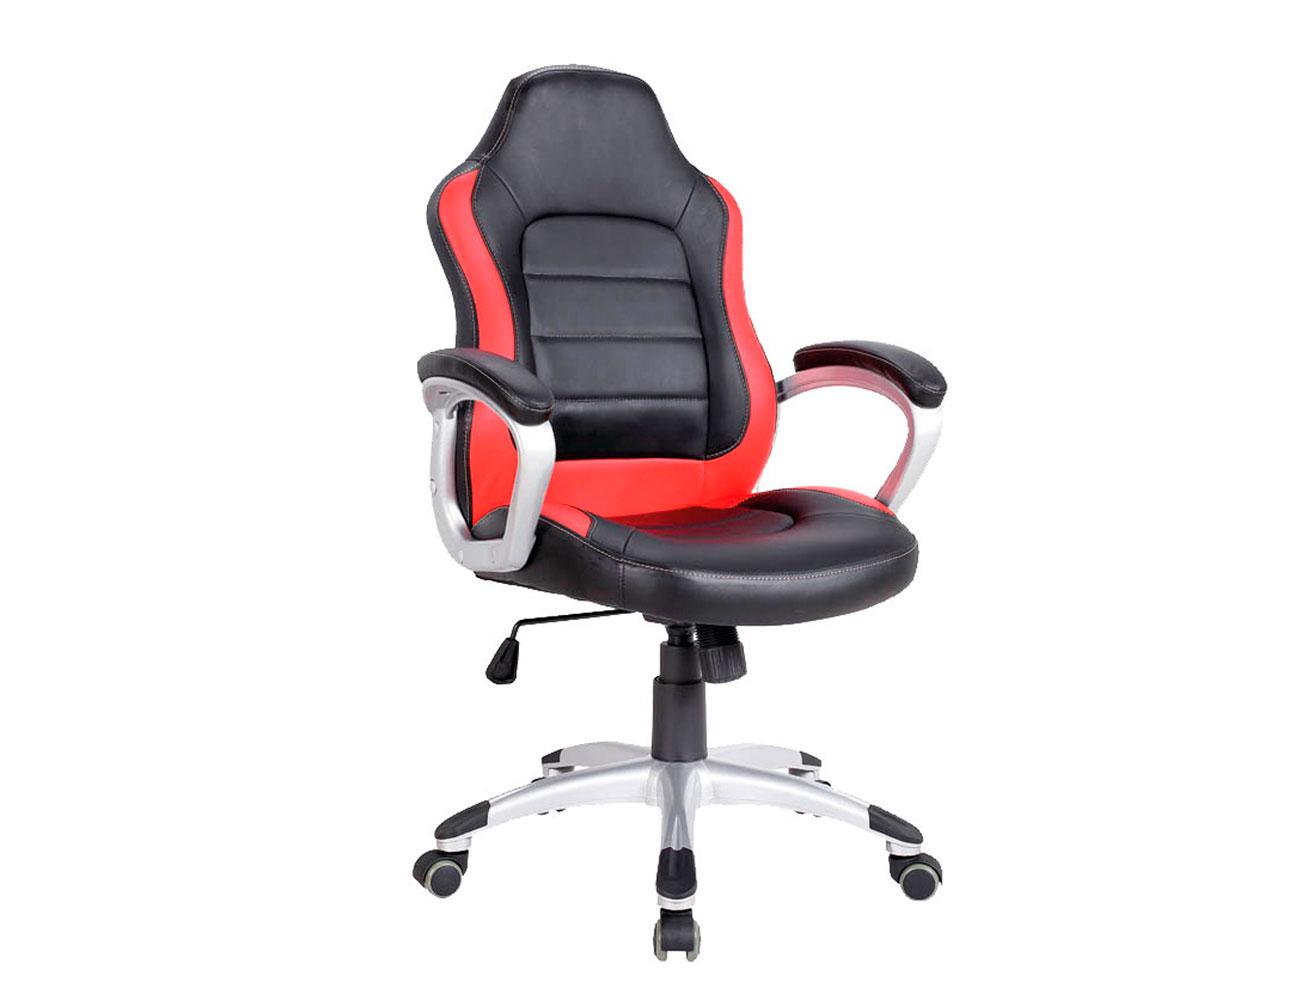 Silla oficina ergonomica polipiel brazos ruedas roja1